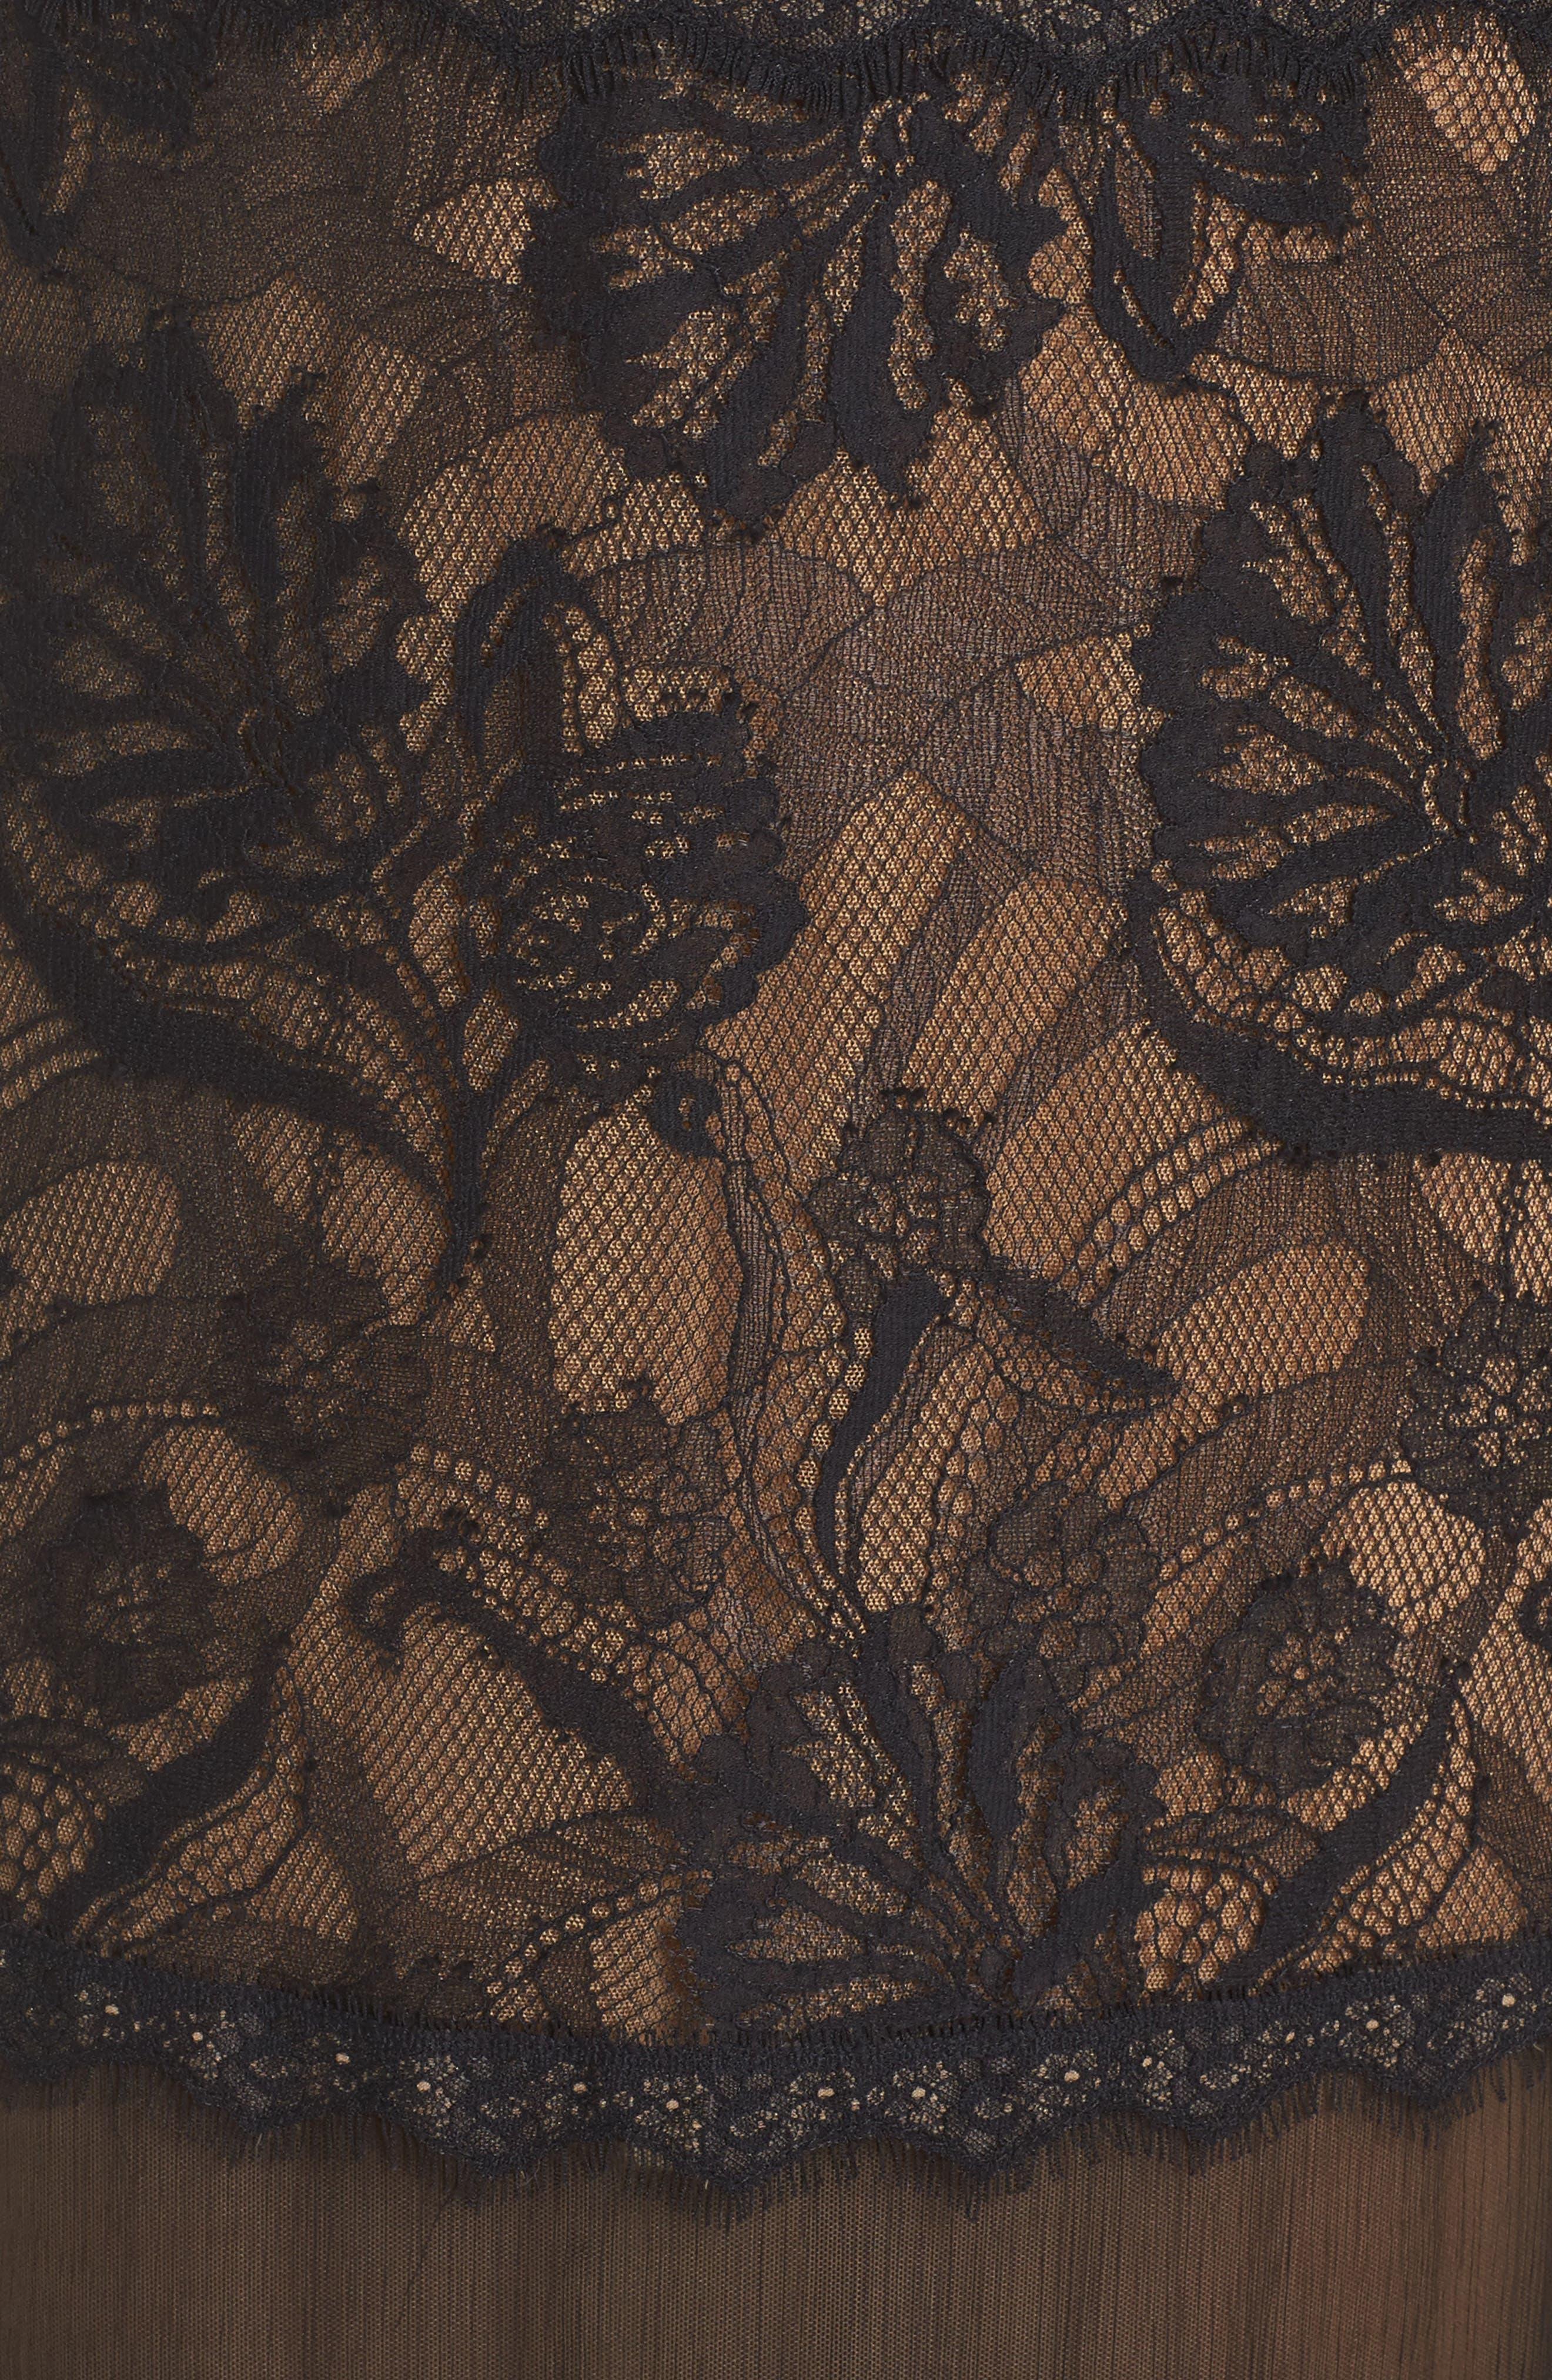 Mermaid Gown,                             Alternate thumbnail 5, color,                             004